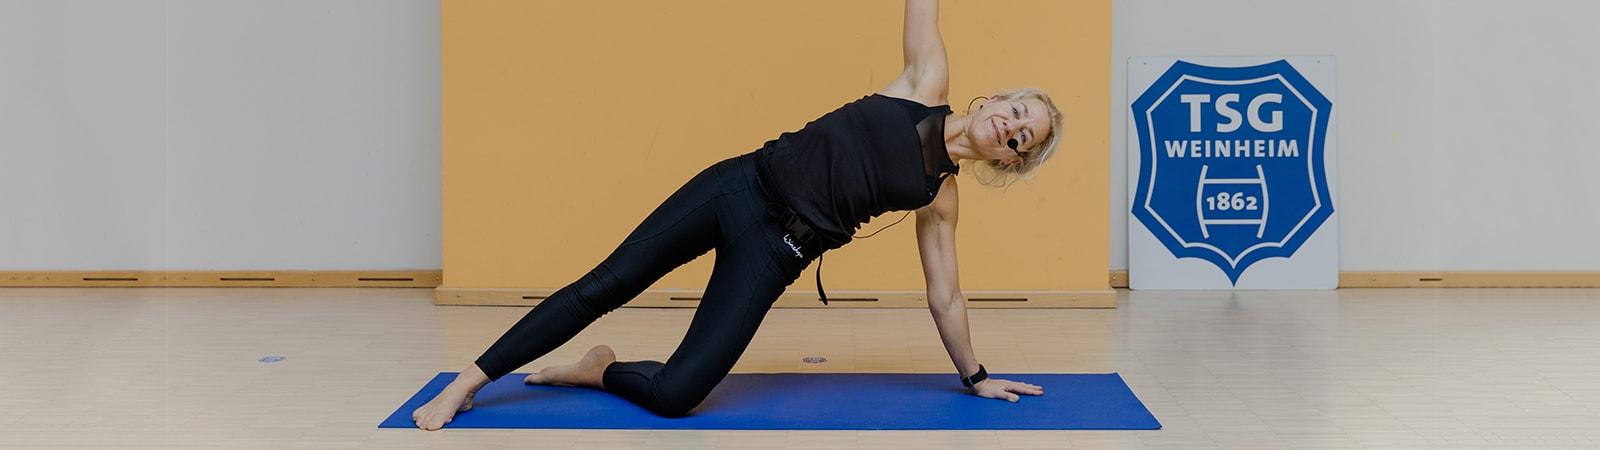 TSG Weinheim - Fitnessvideos